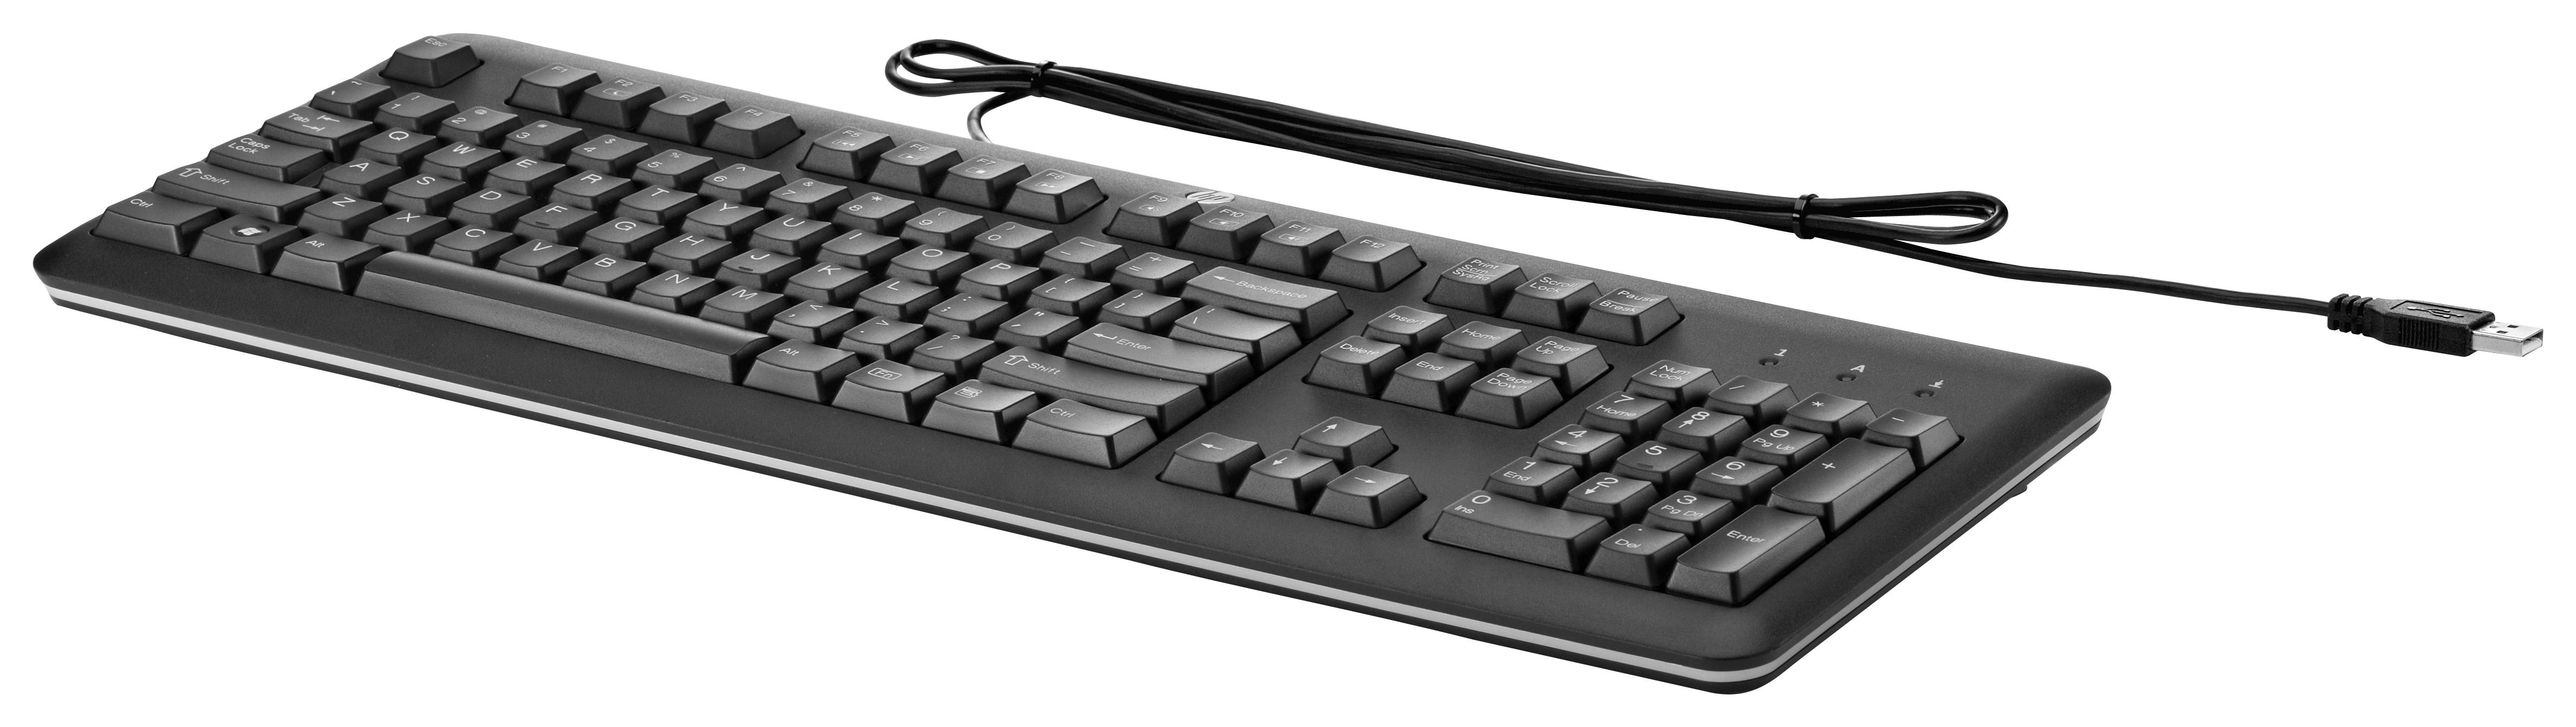 Hp Hp - Keyboard - Usb - English - United Kingdom - For Hp 260 G3  285 G3  T430; Elitedesk 800 G4; Eliteone 1000 G1  1000 G2; Rp9 G1 Retail System Qy776aa#abu - xep01